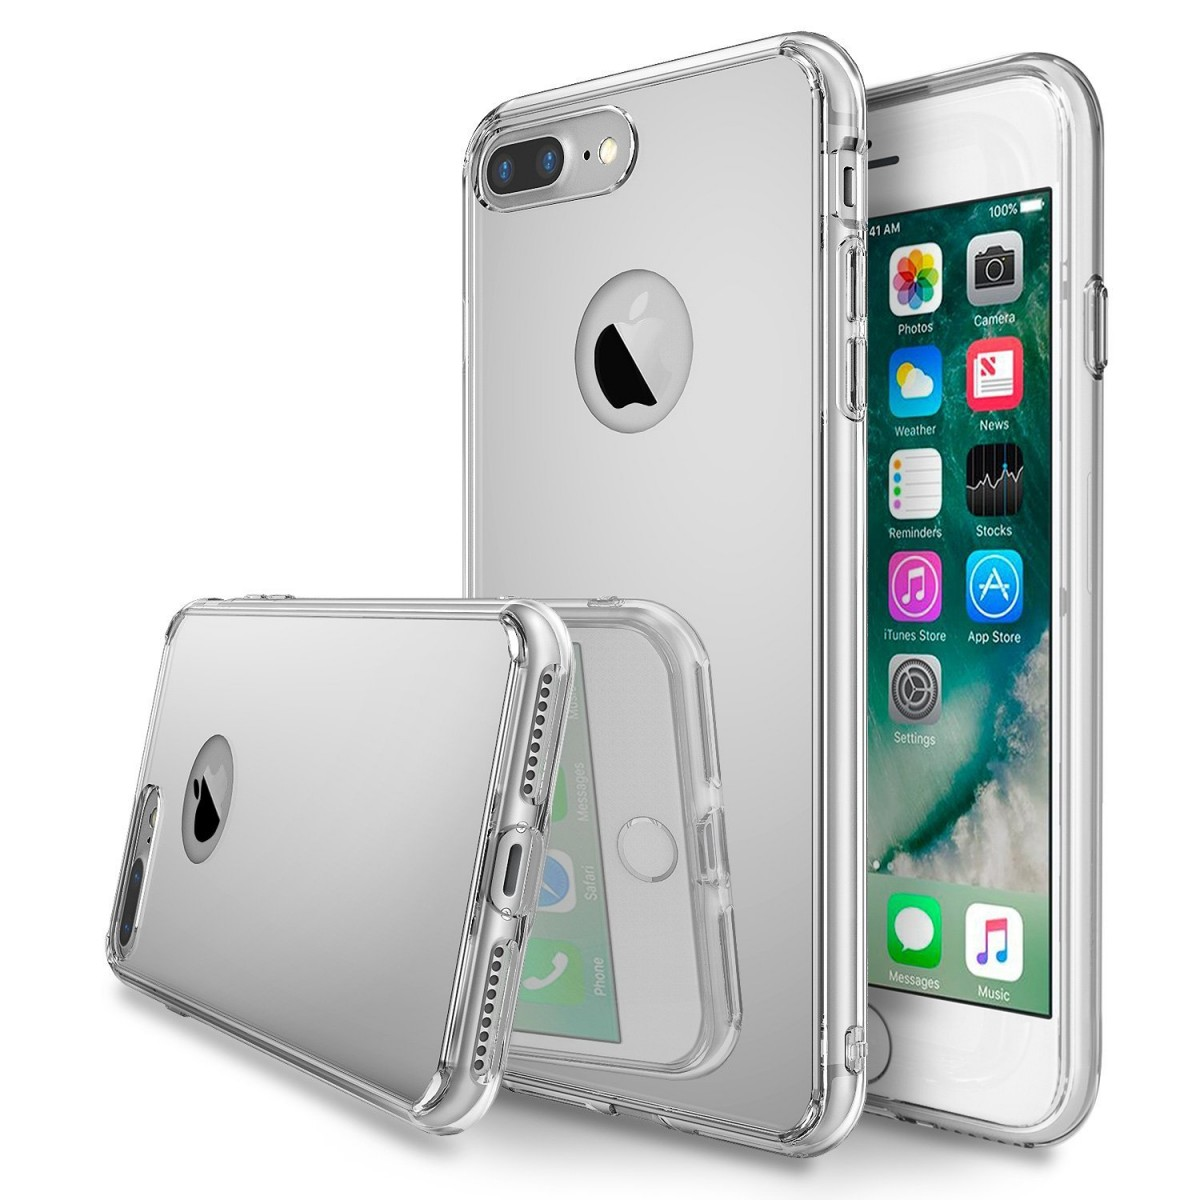 Zrcadlový kryt My Mirror pro iPhone 7 Plus - Stříbrný (silver)